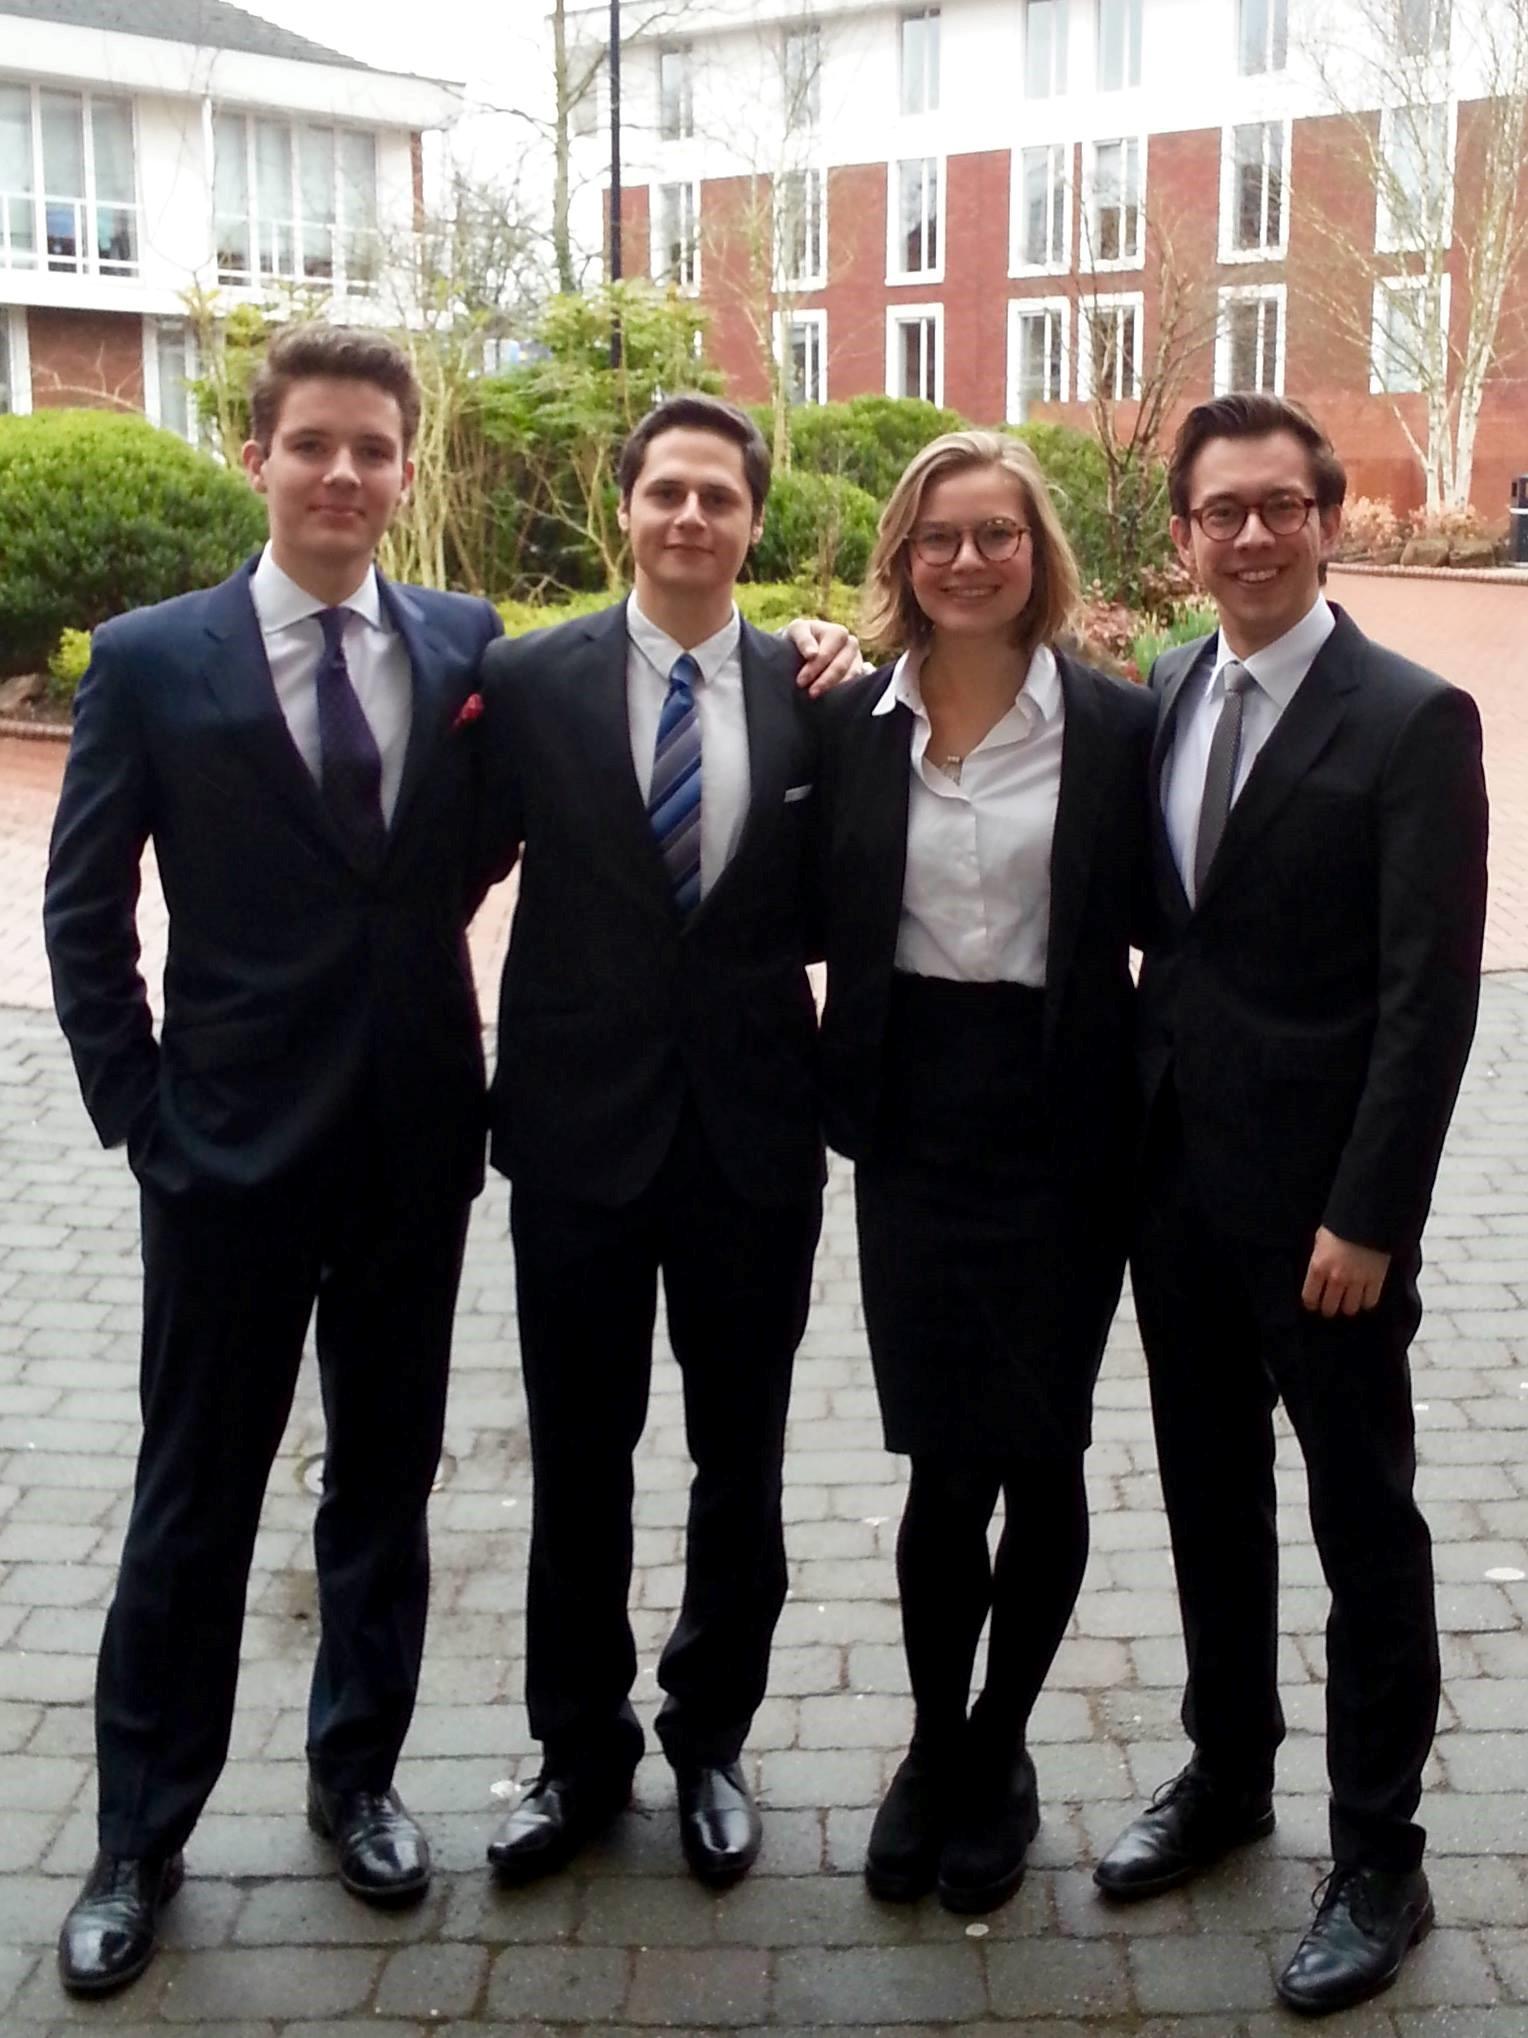 Dating law school student